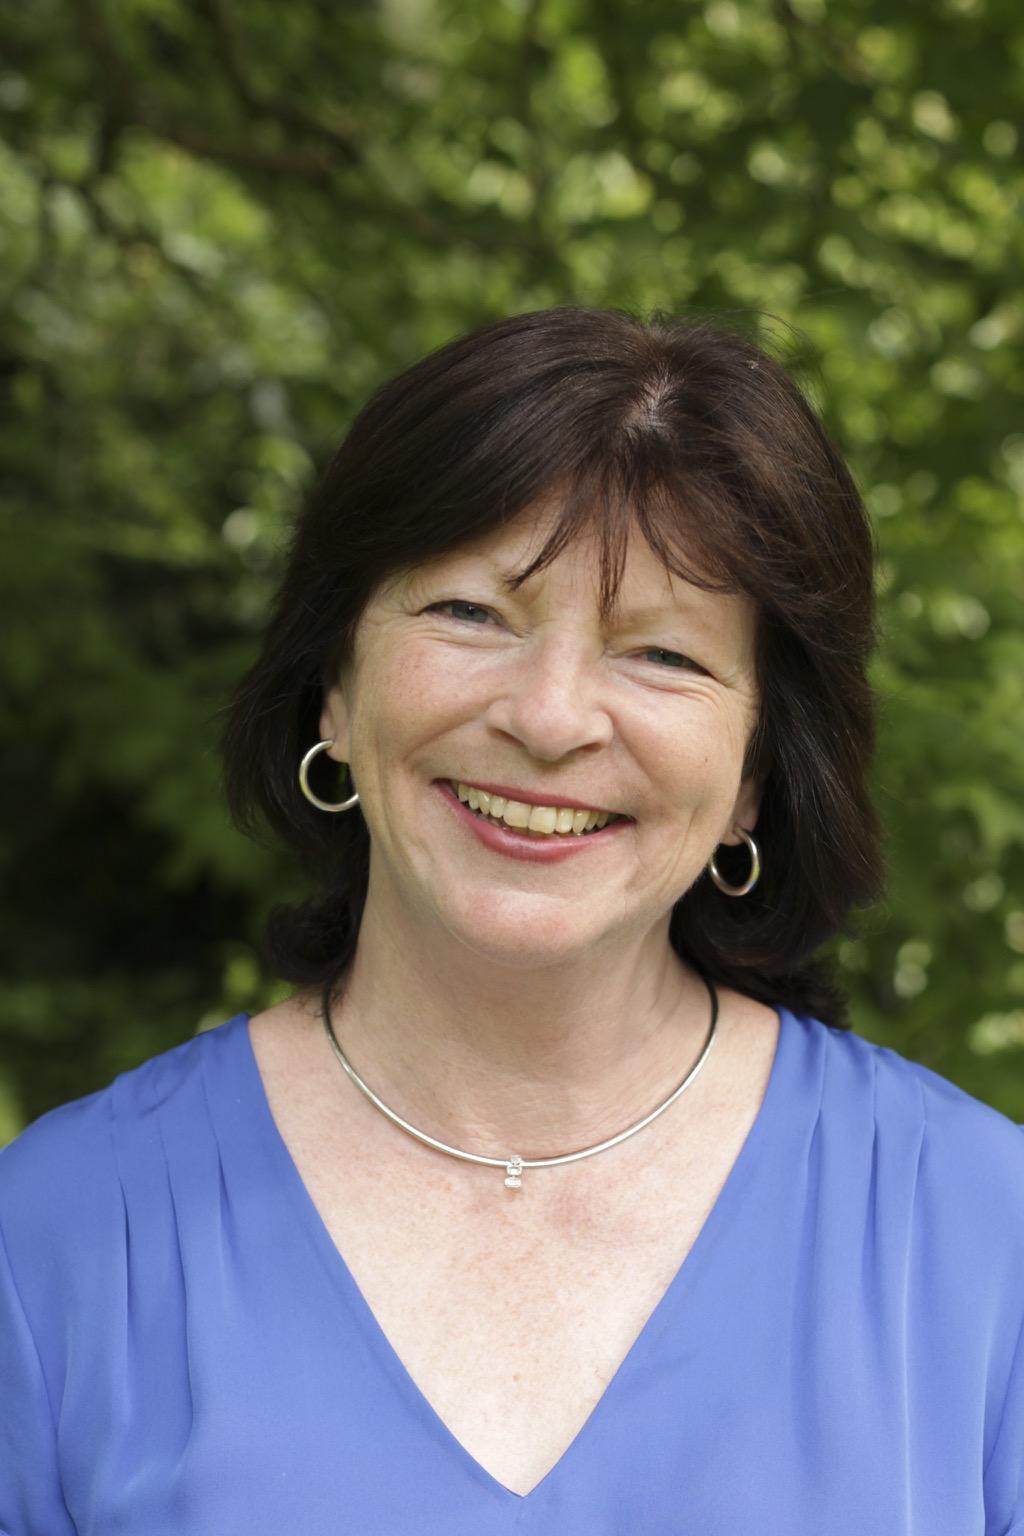 Lynne Jenner